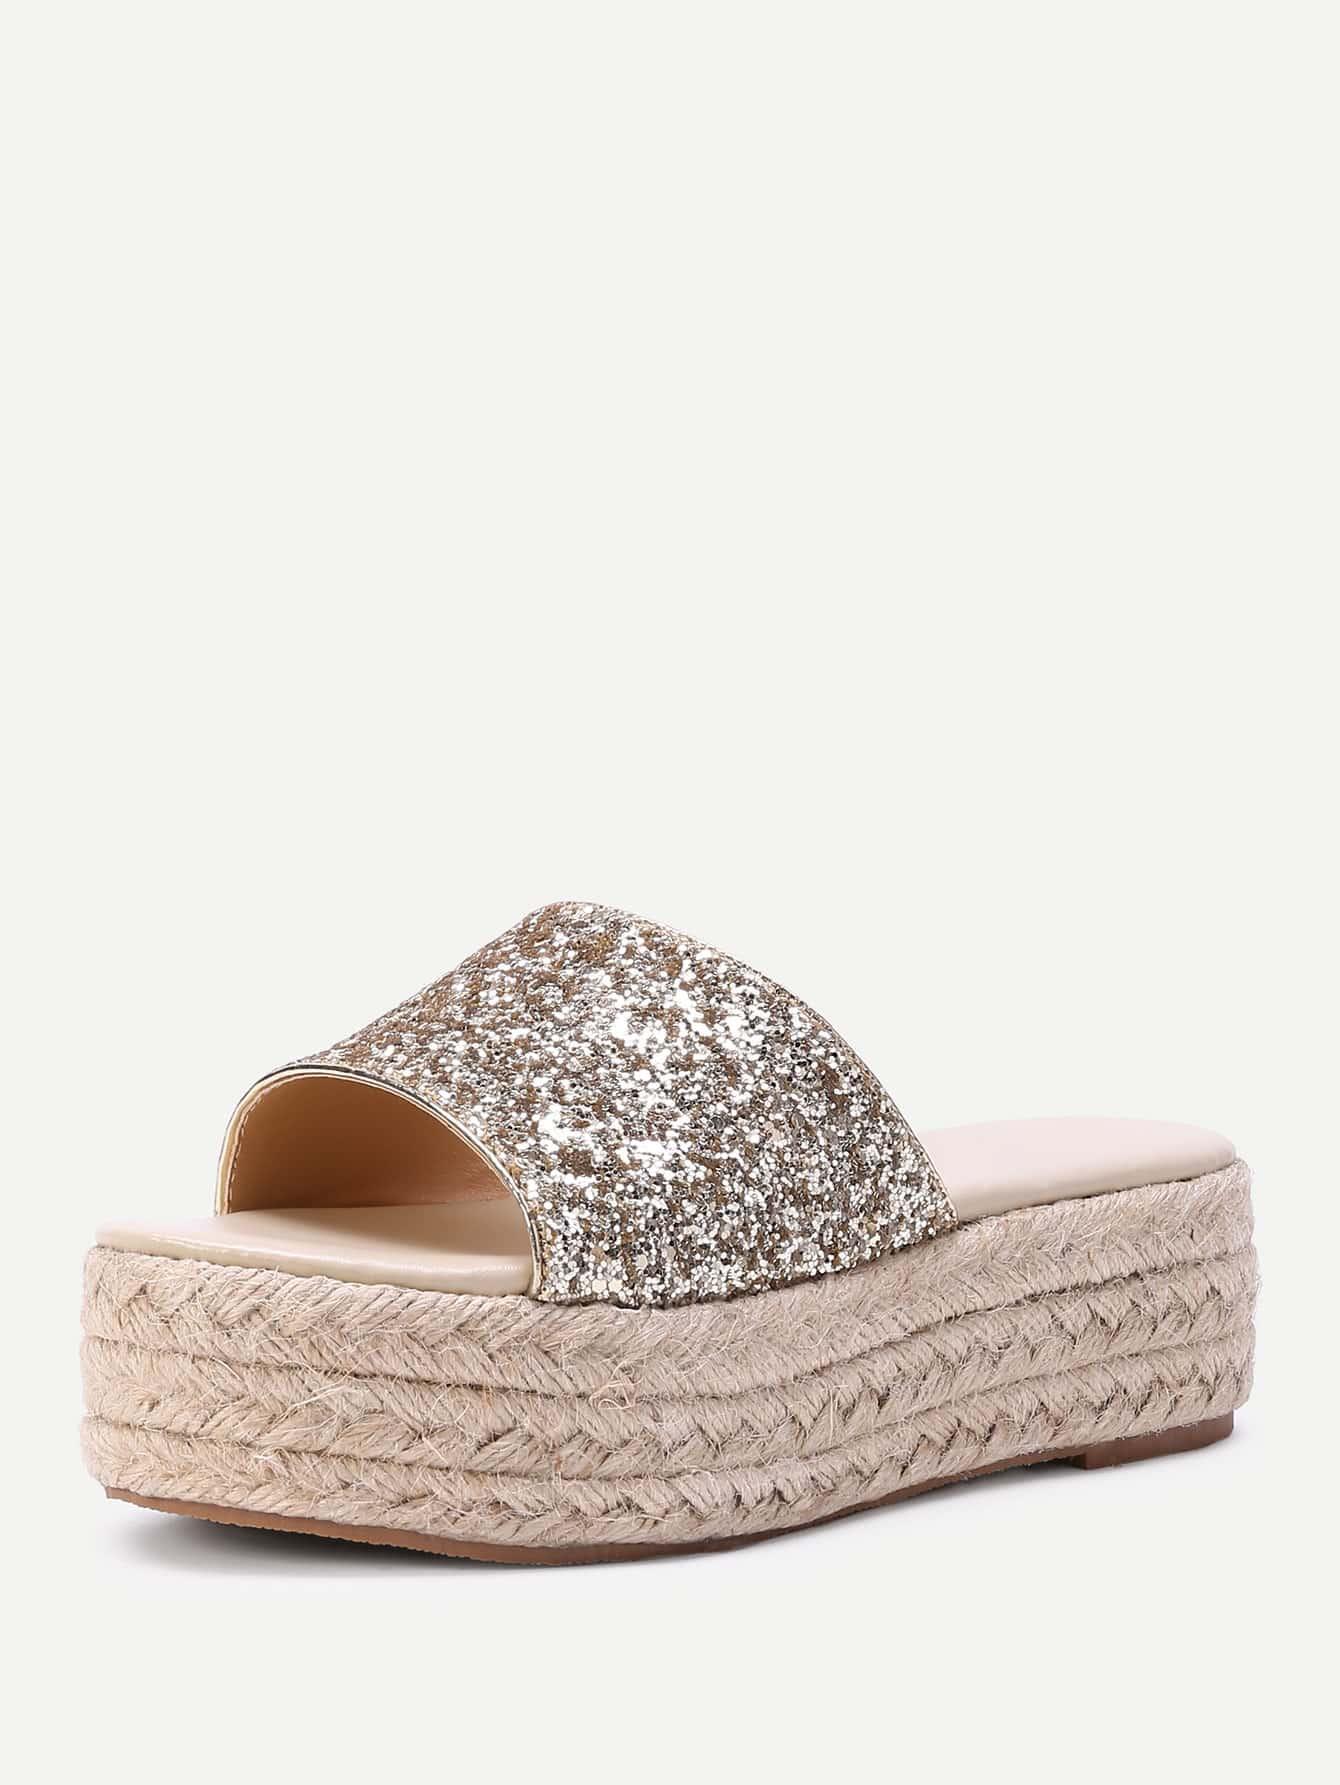 b87fba8c43a Cheap Glitter Design Woven Flatform Sandals for sale Australia